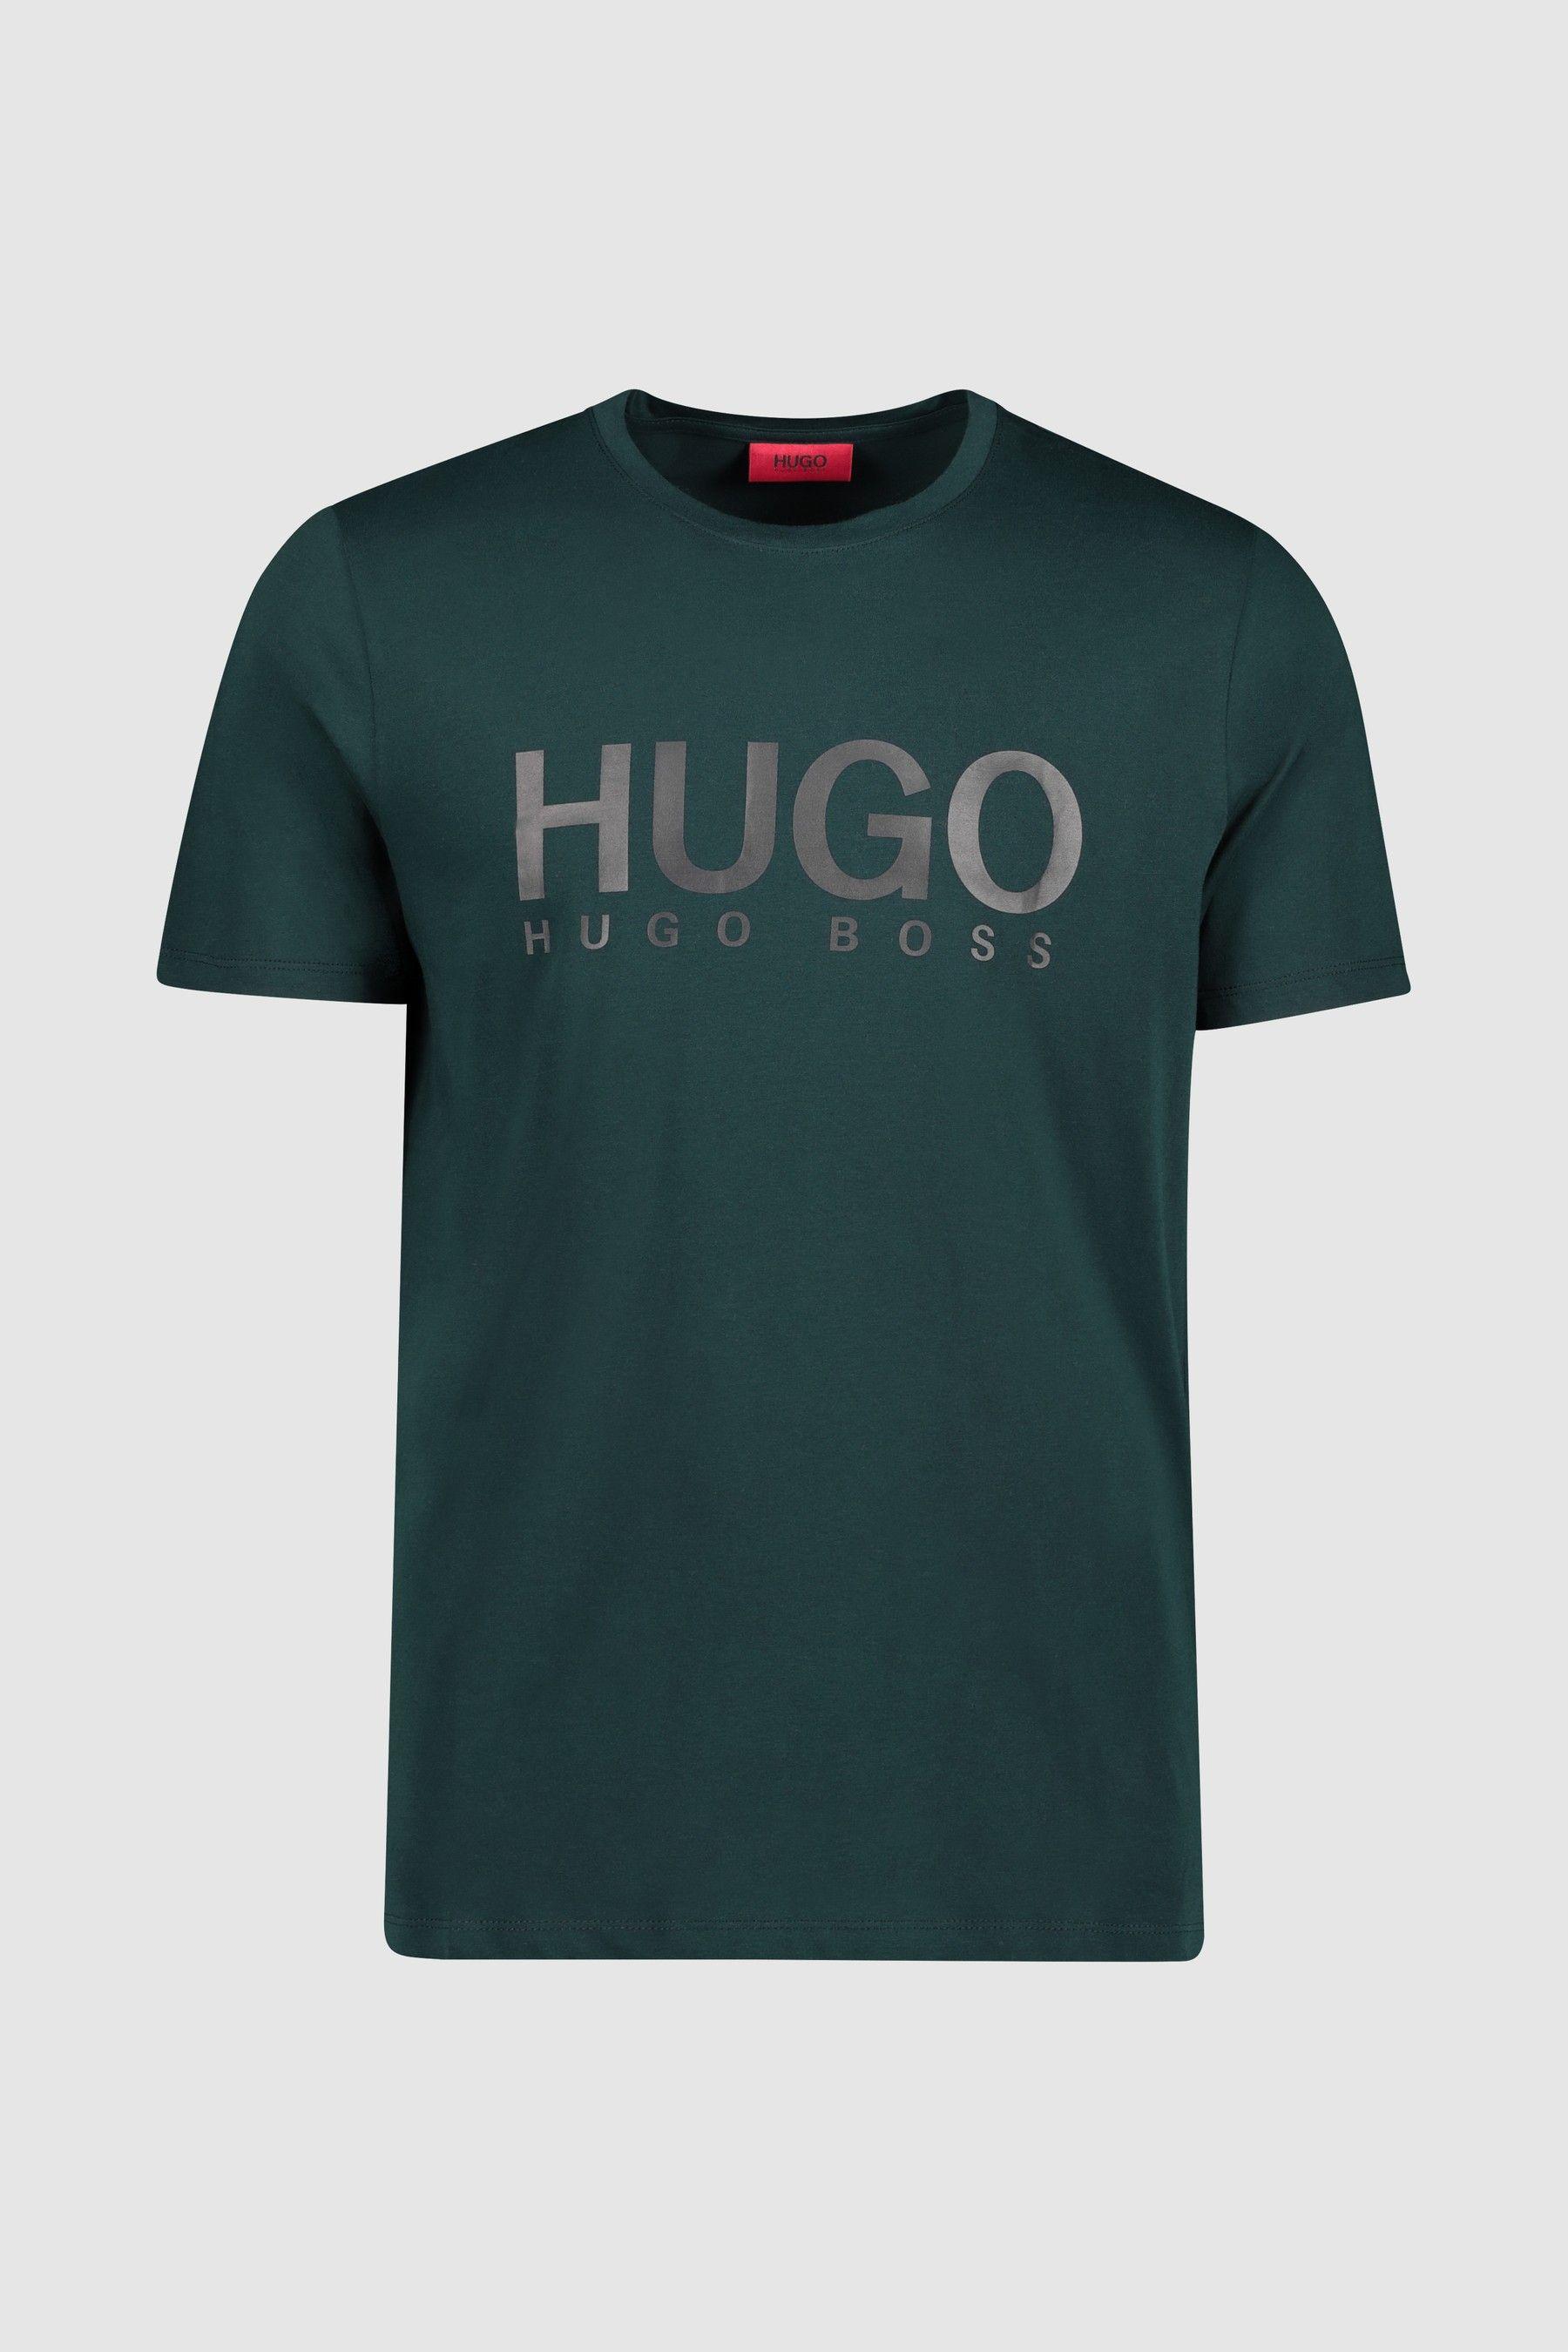 hugo boss mens tops uk